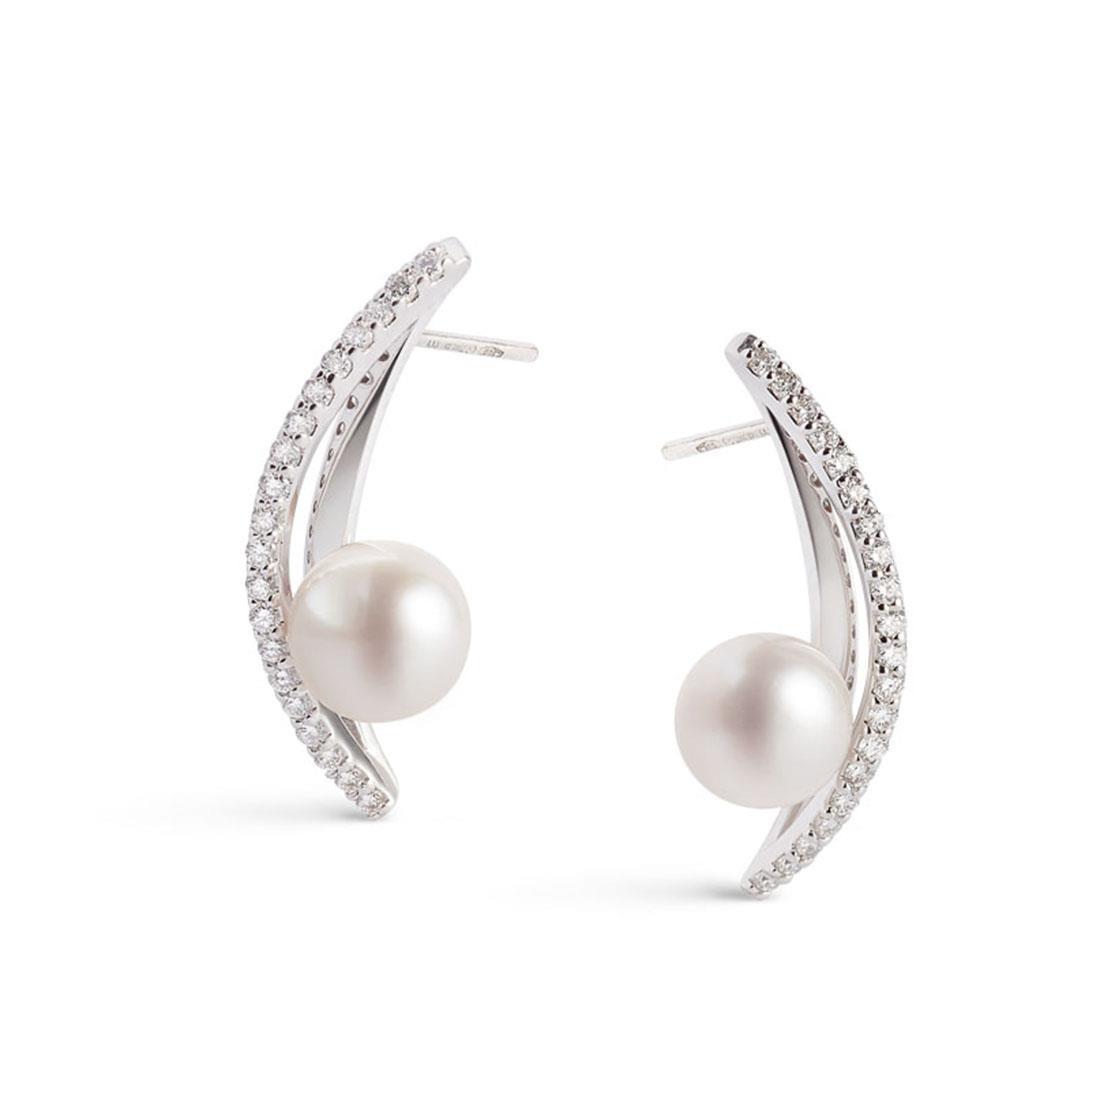 Orecchini design con perle Akoya - ALFIERI & ST. JOHN